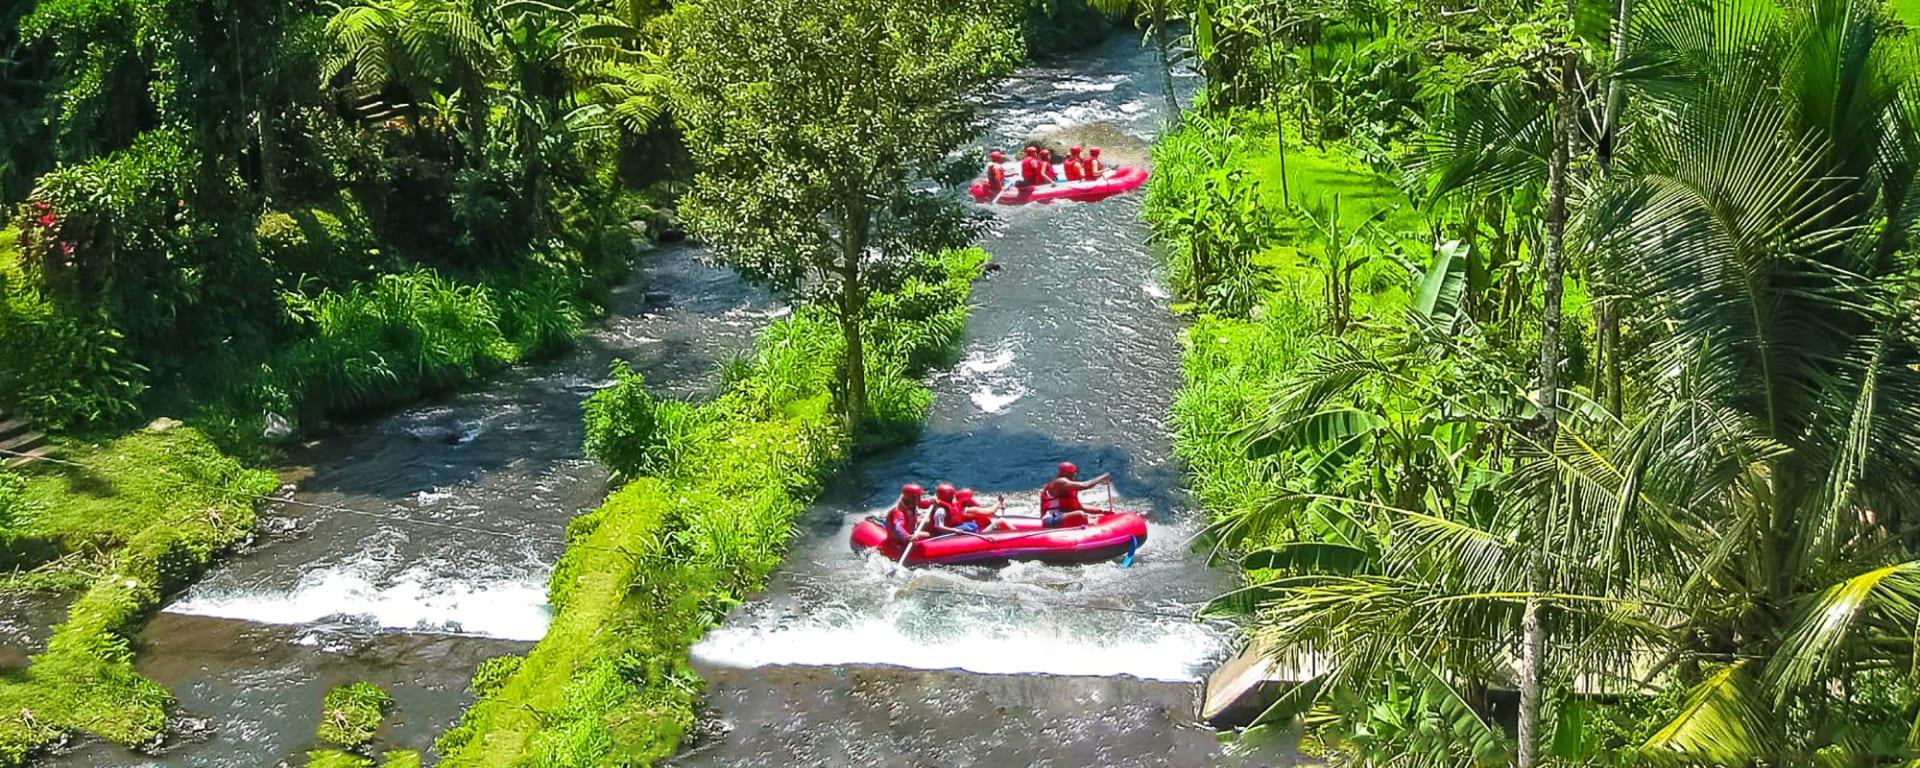 Bali aktiv erleben ab Südbali: Bali - Rafting in the canyon